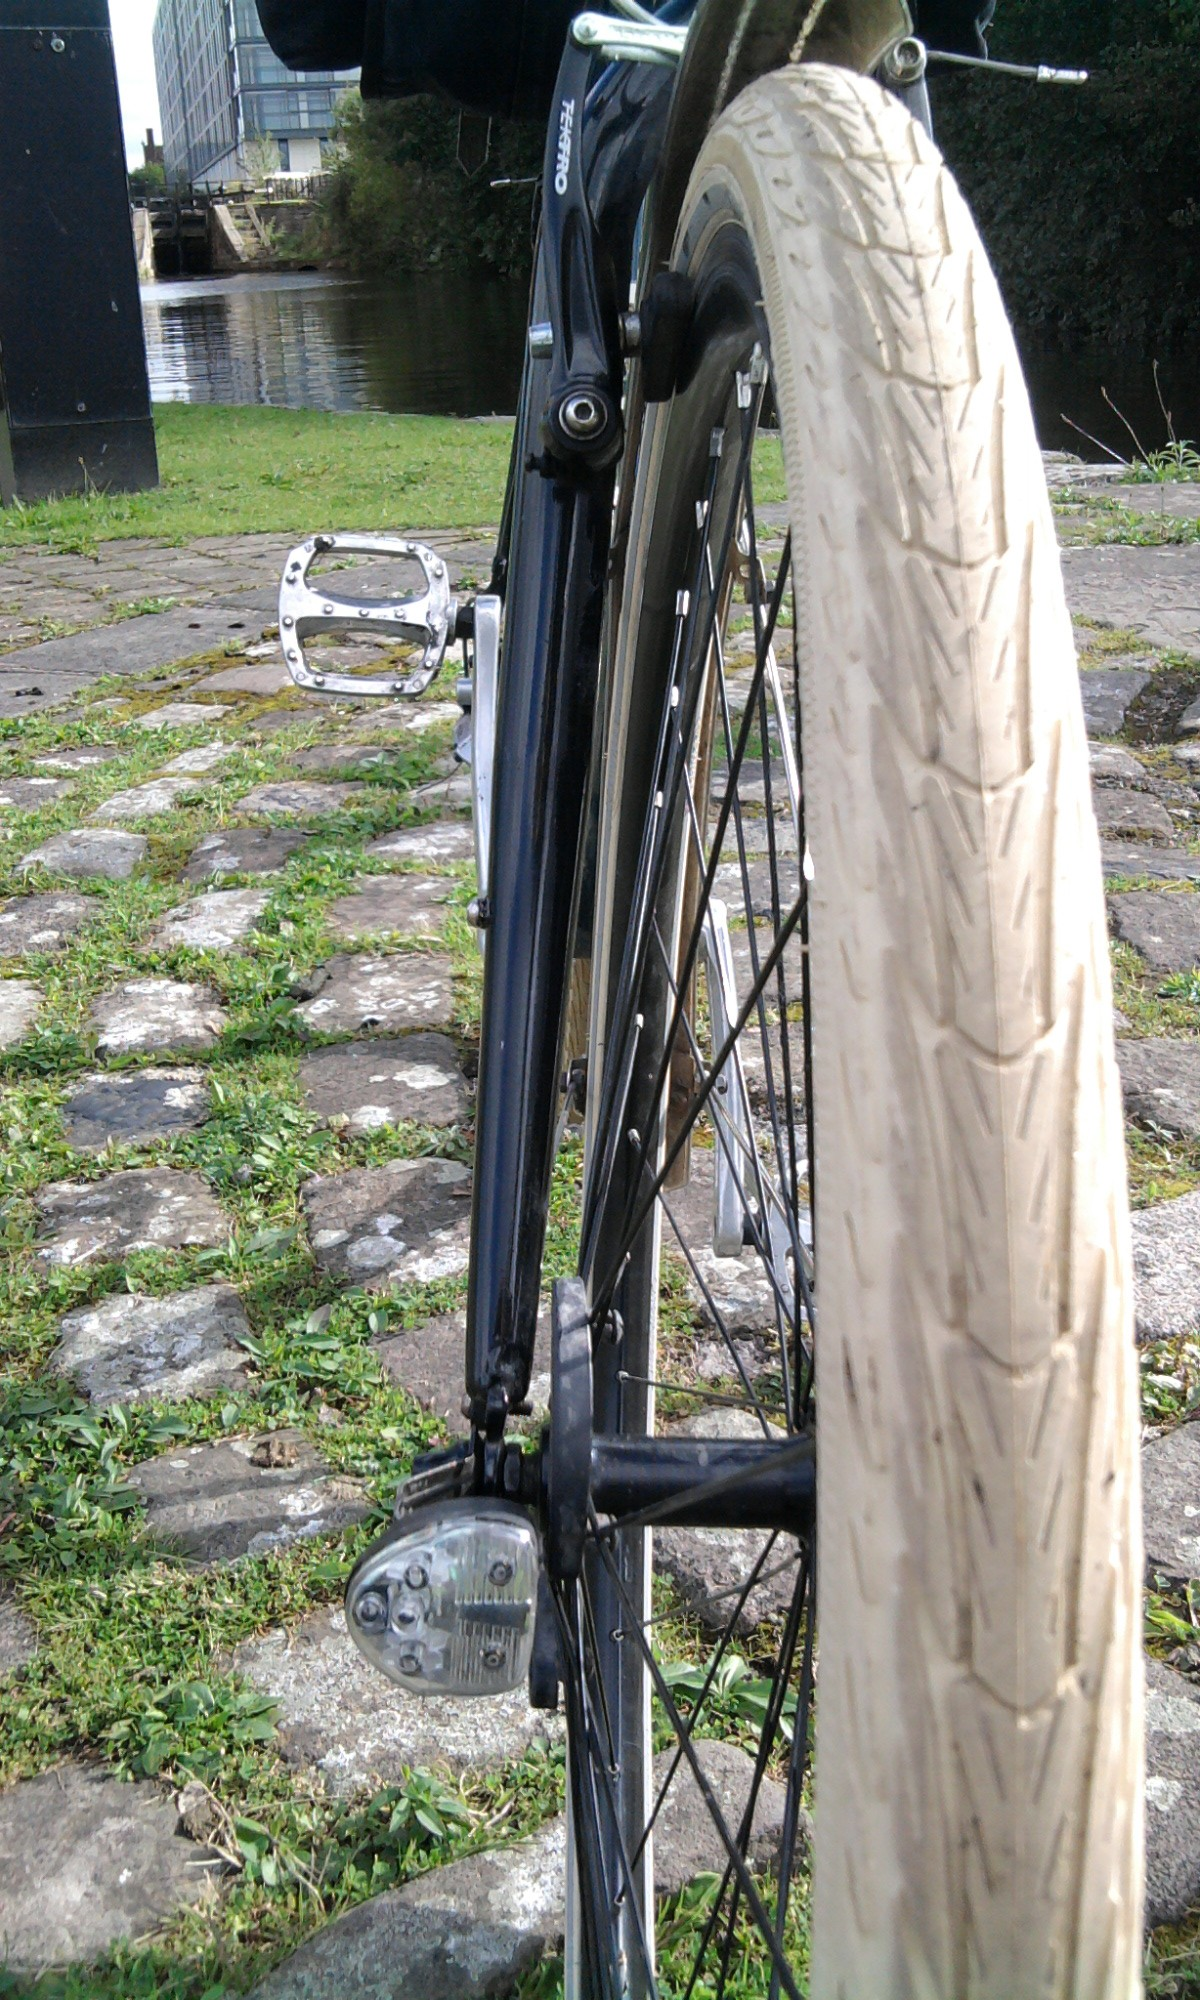 700 x 25c SCHWALBE MARATHON Puncture Resistant Roadster Bike Tyre Black